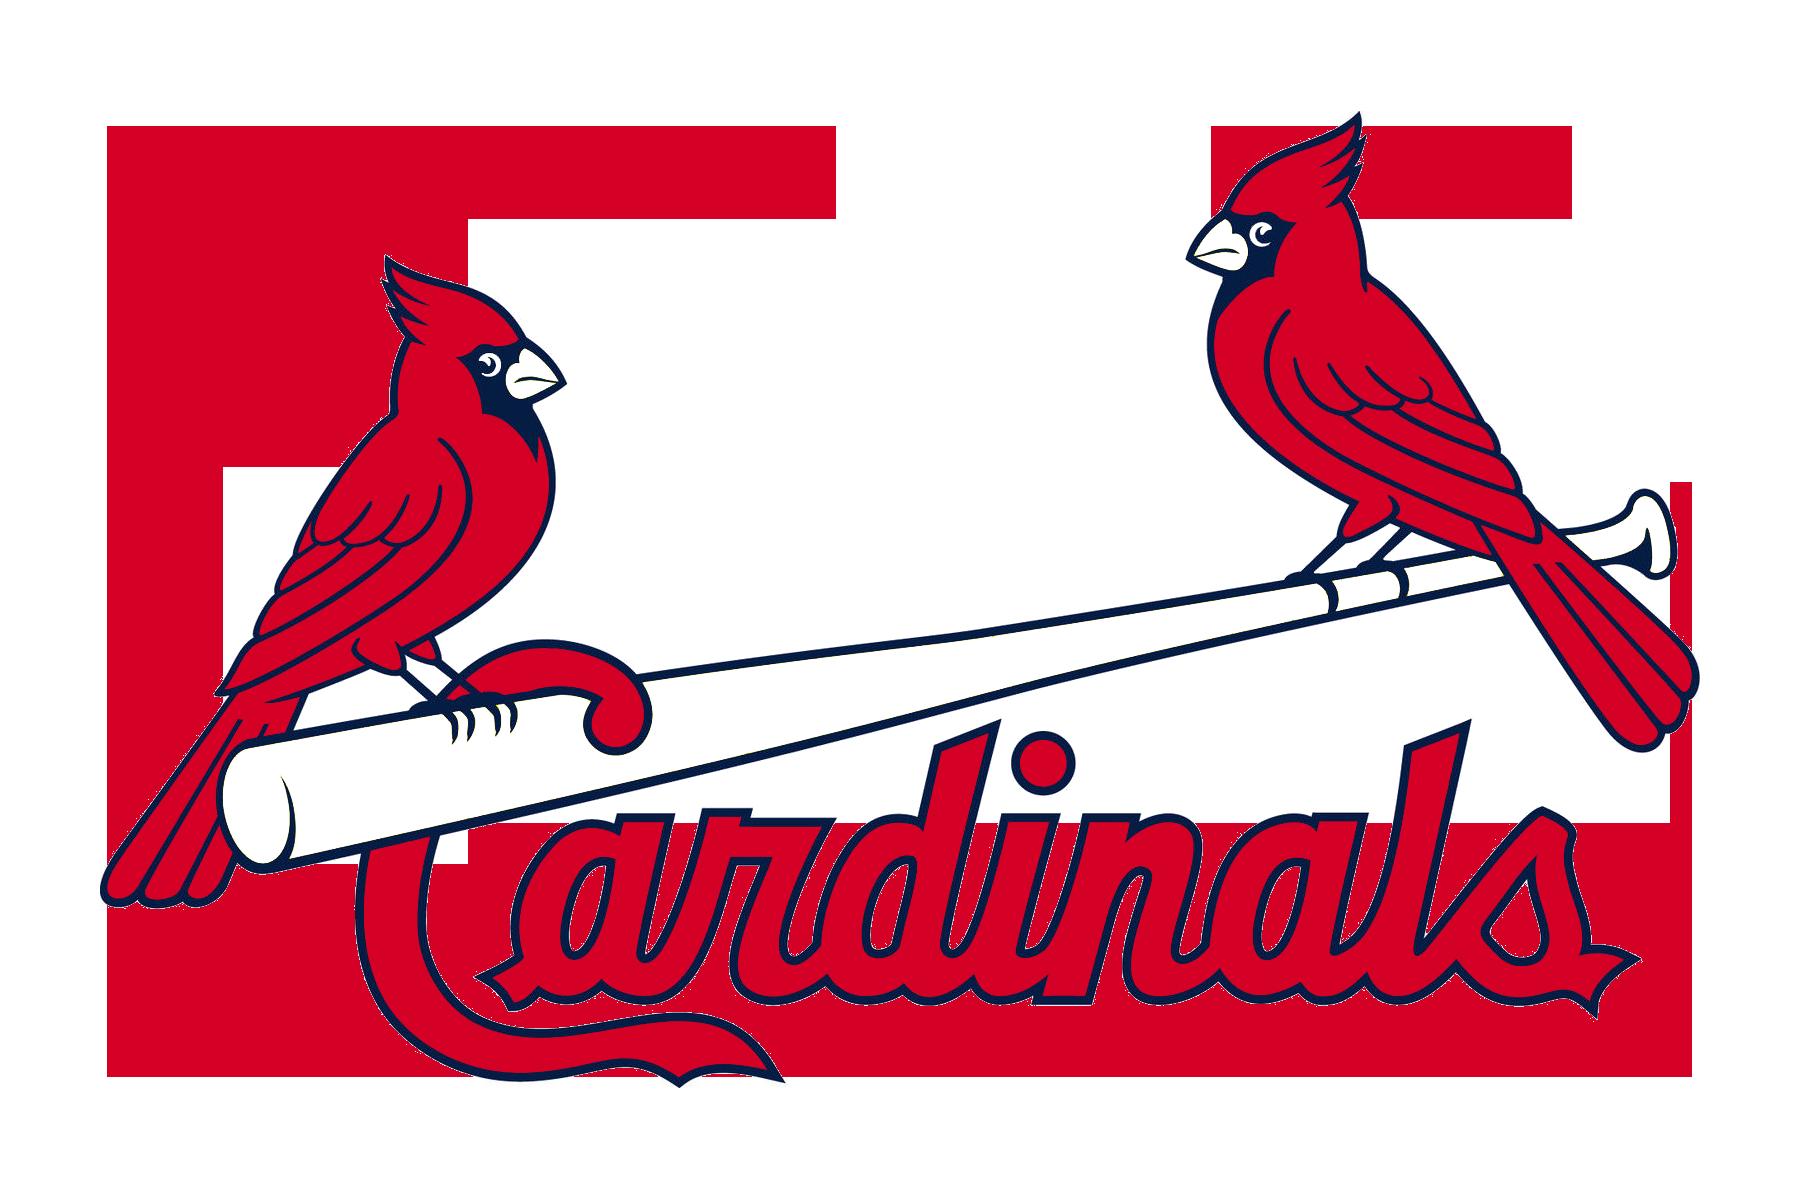 st louis cardinals logo png transparent svg vector freebie supply rh freebiesupply com Green St. Louis Cardinals Logo Green St. Louis Cardinals Logo